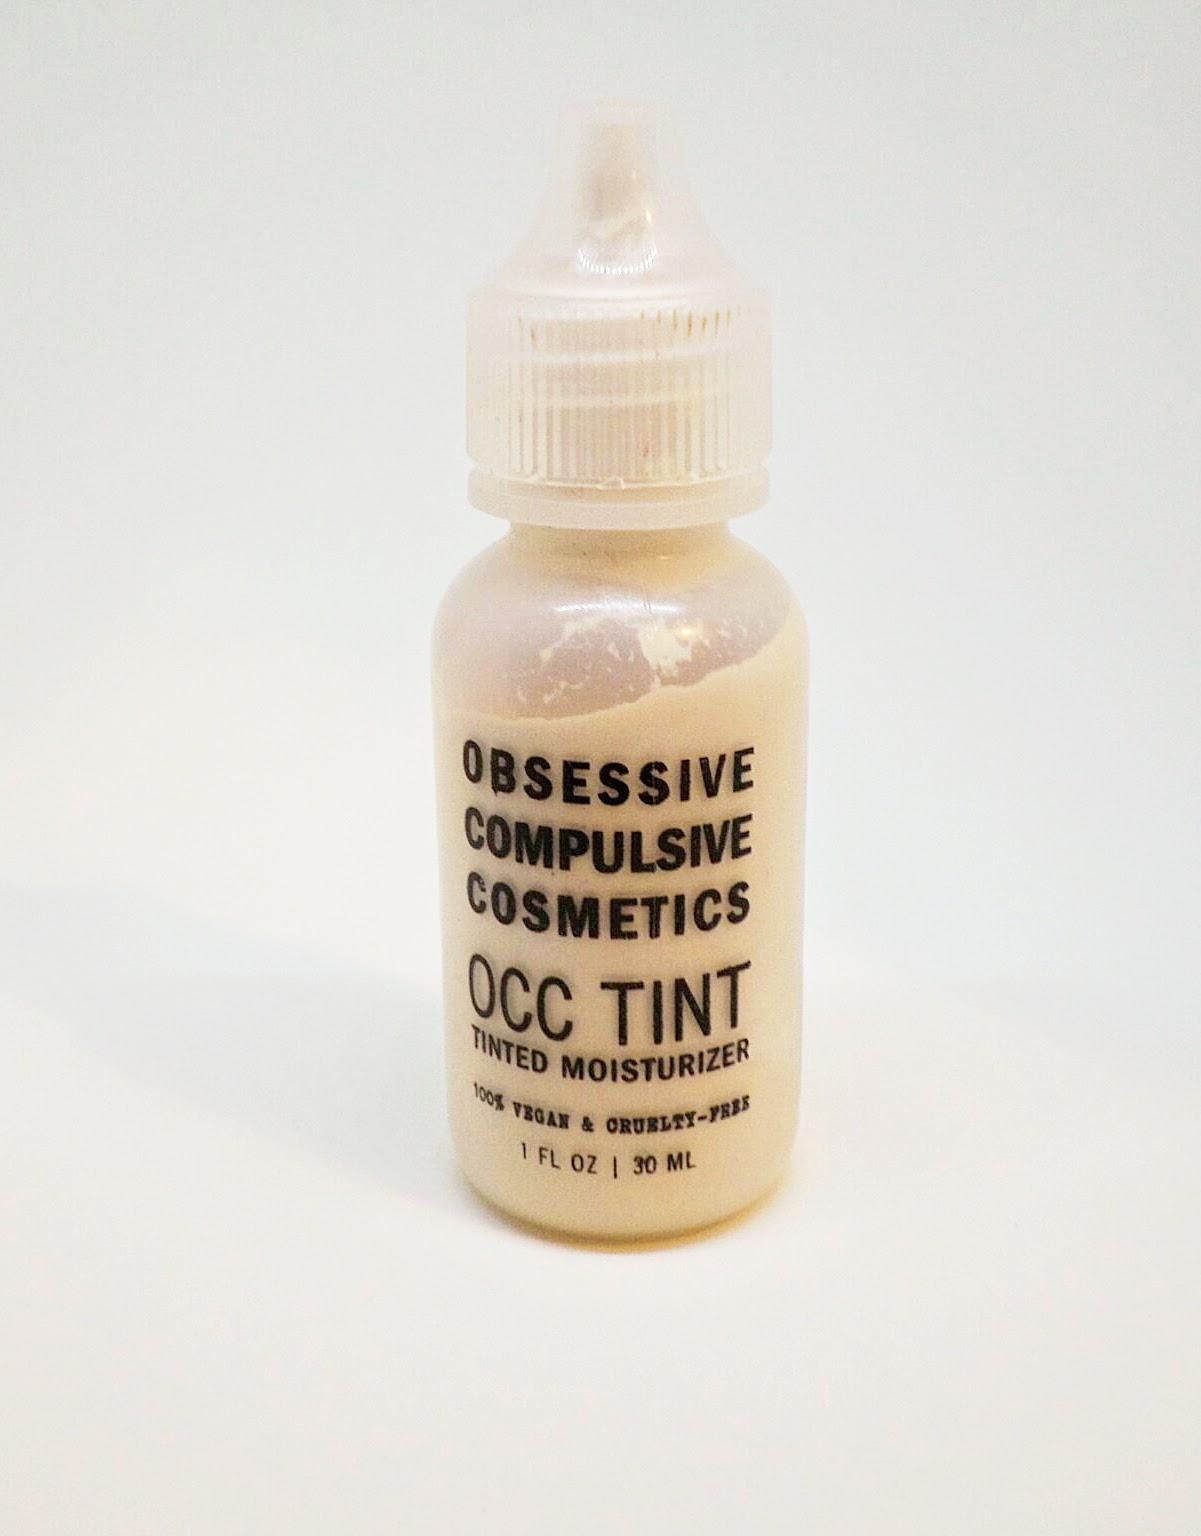 Obsessive Compulsive Cosmetics Skin Tint